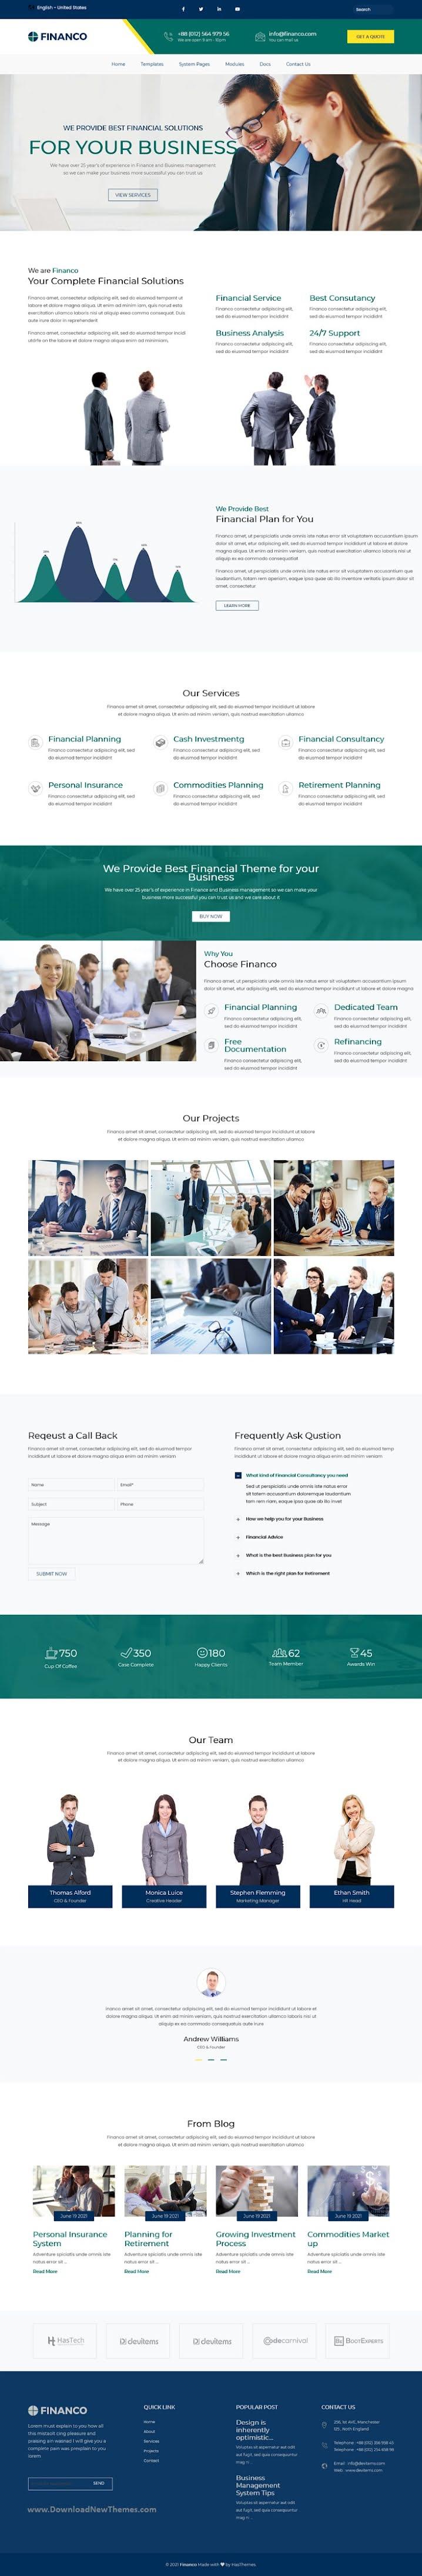 Financo - Investment HubSpot Theme